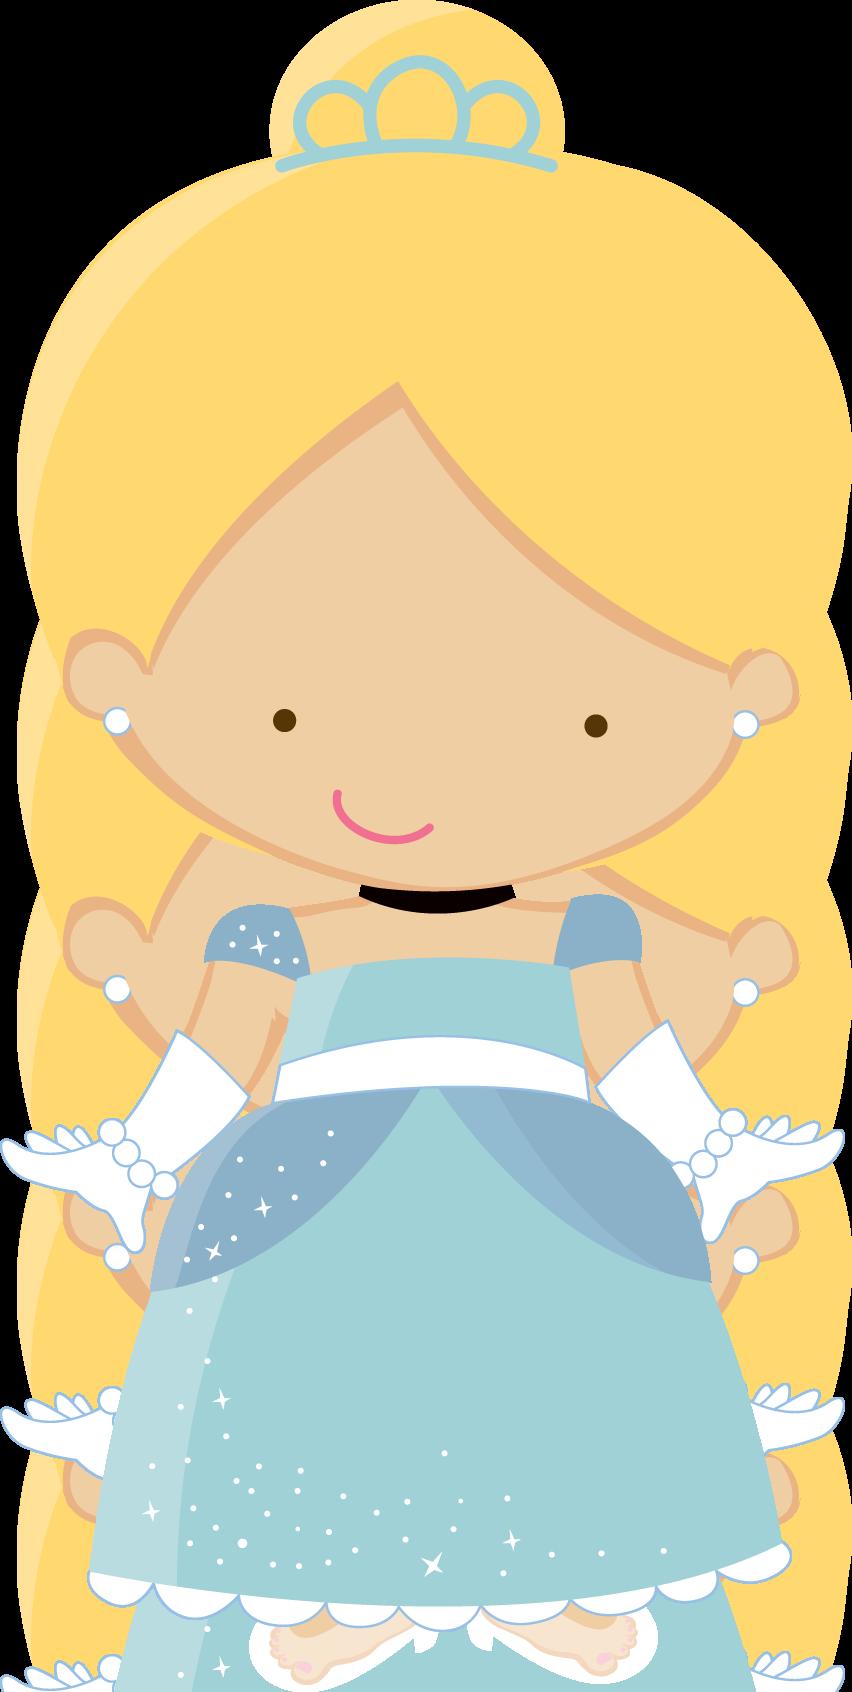 Cutes ii zwd png. Playdough clipart princess disney